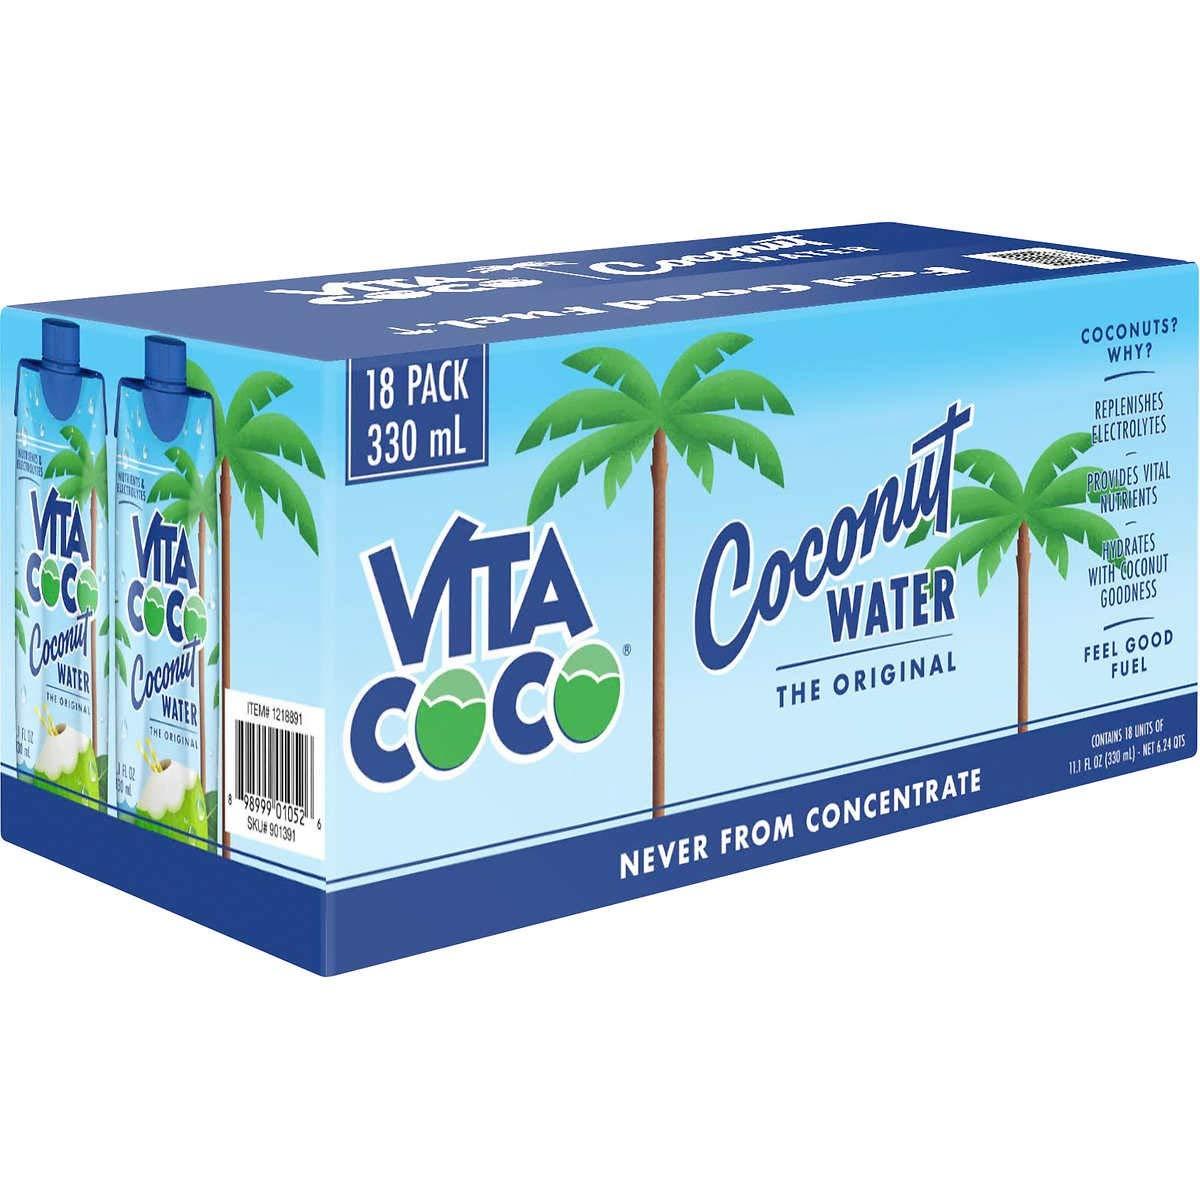 Vita Coco Coconut Water, Original, 11.1 Fluid Ounce (18 Count)